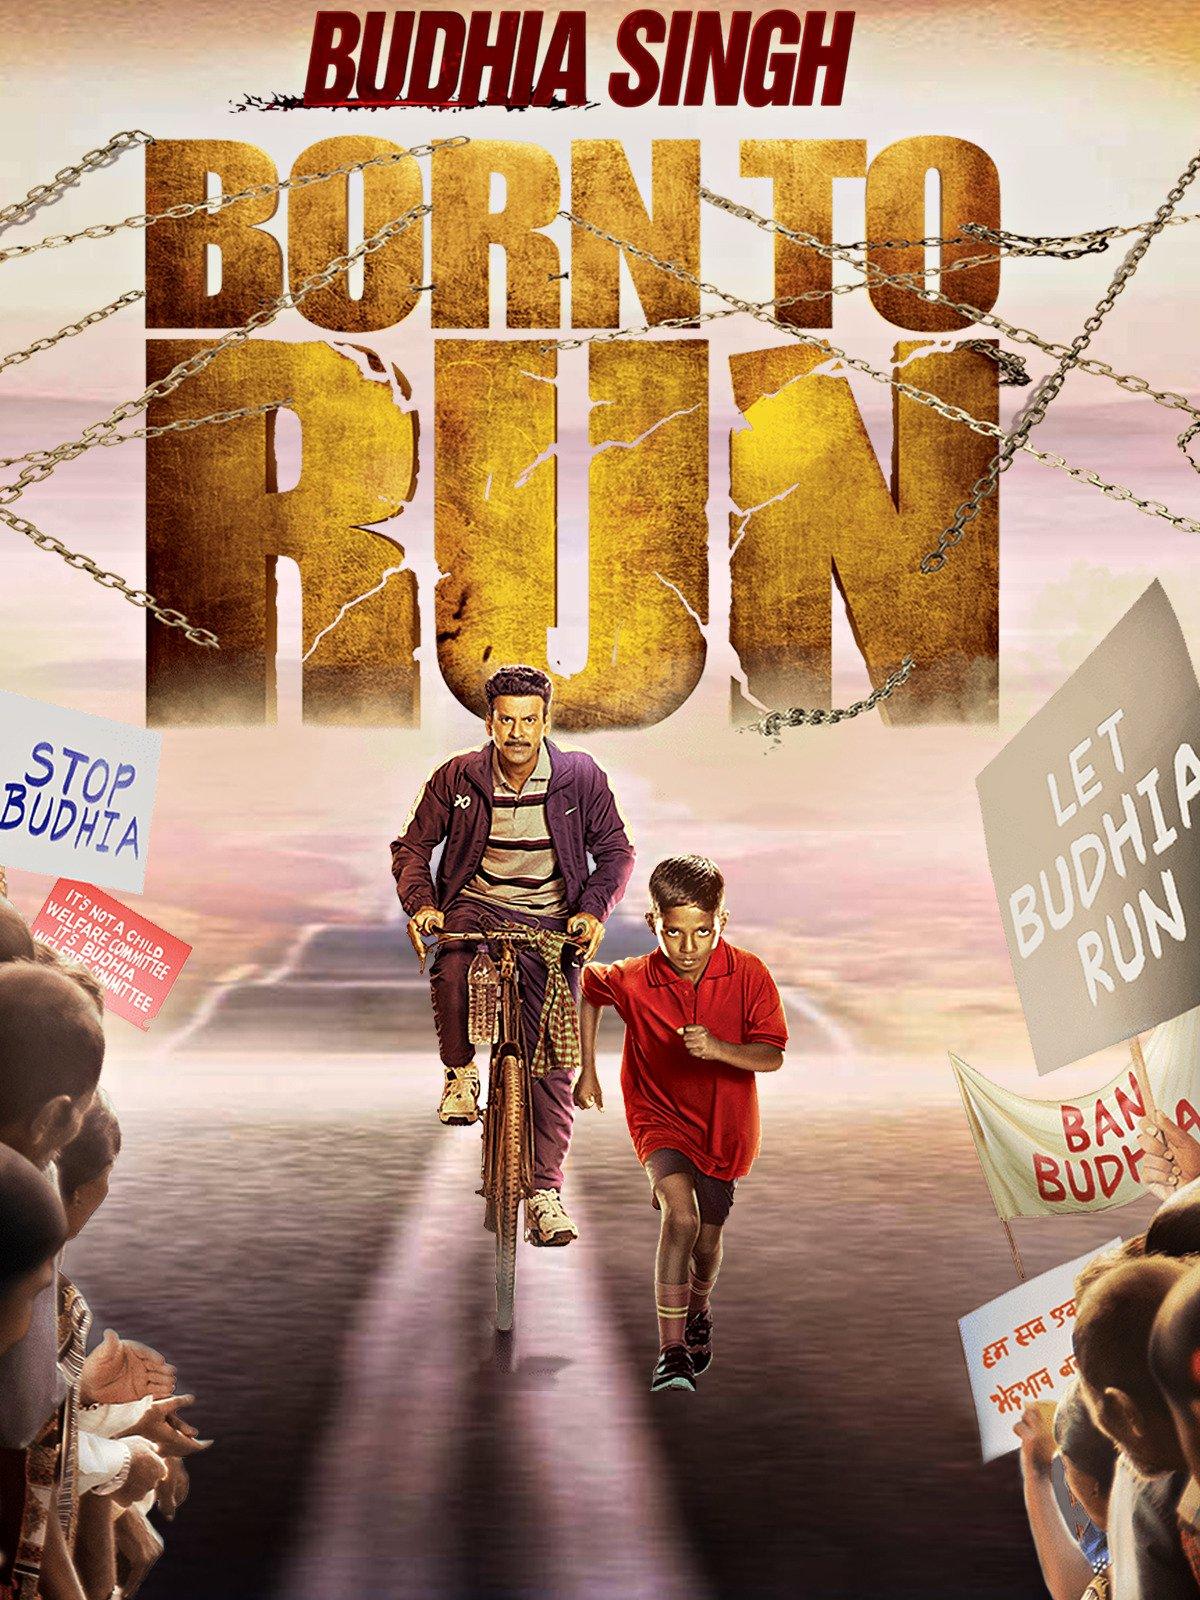 Watch Budhia Singh: Born to Run | Prime Video